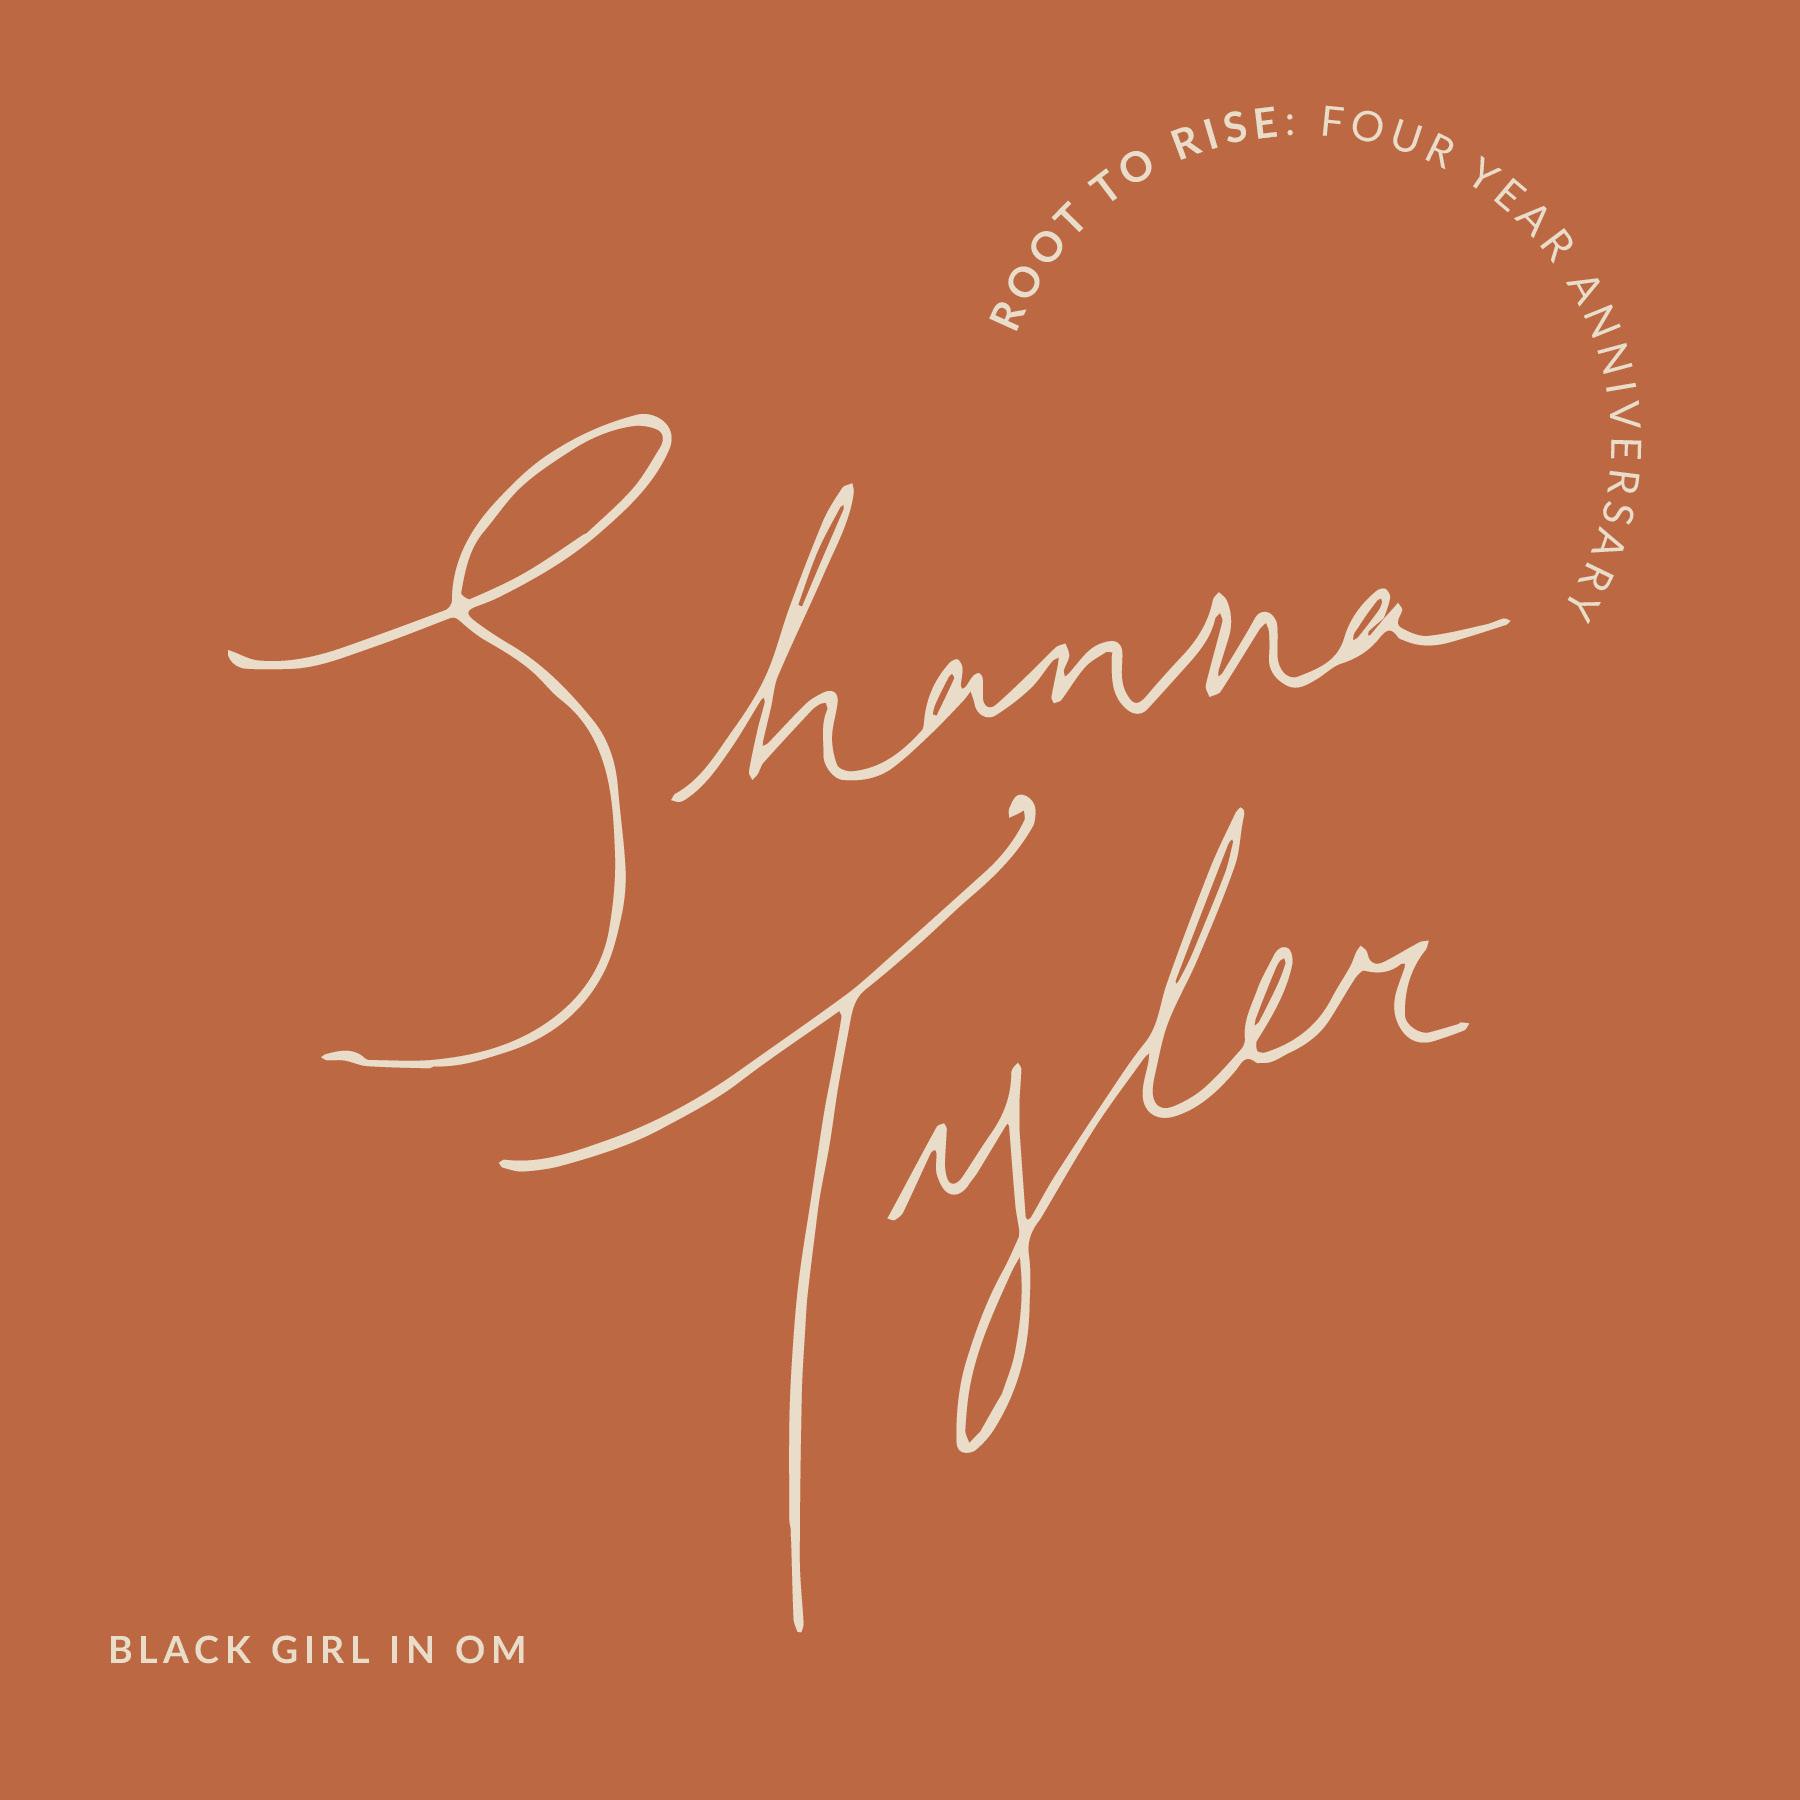 Shanna Tyler.jpg